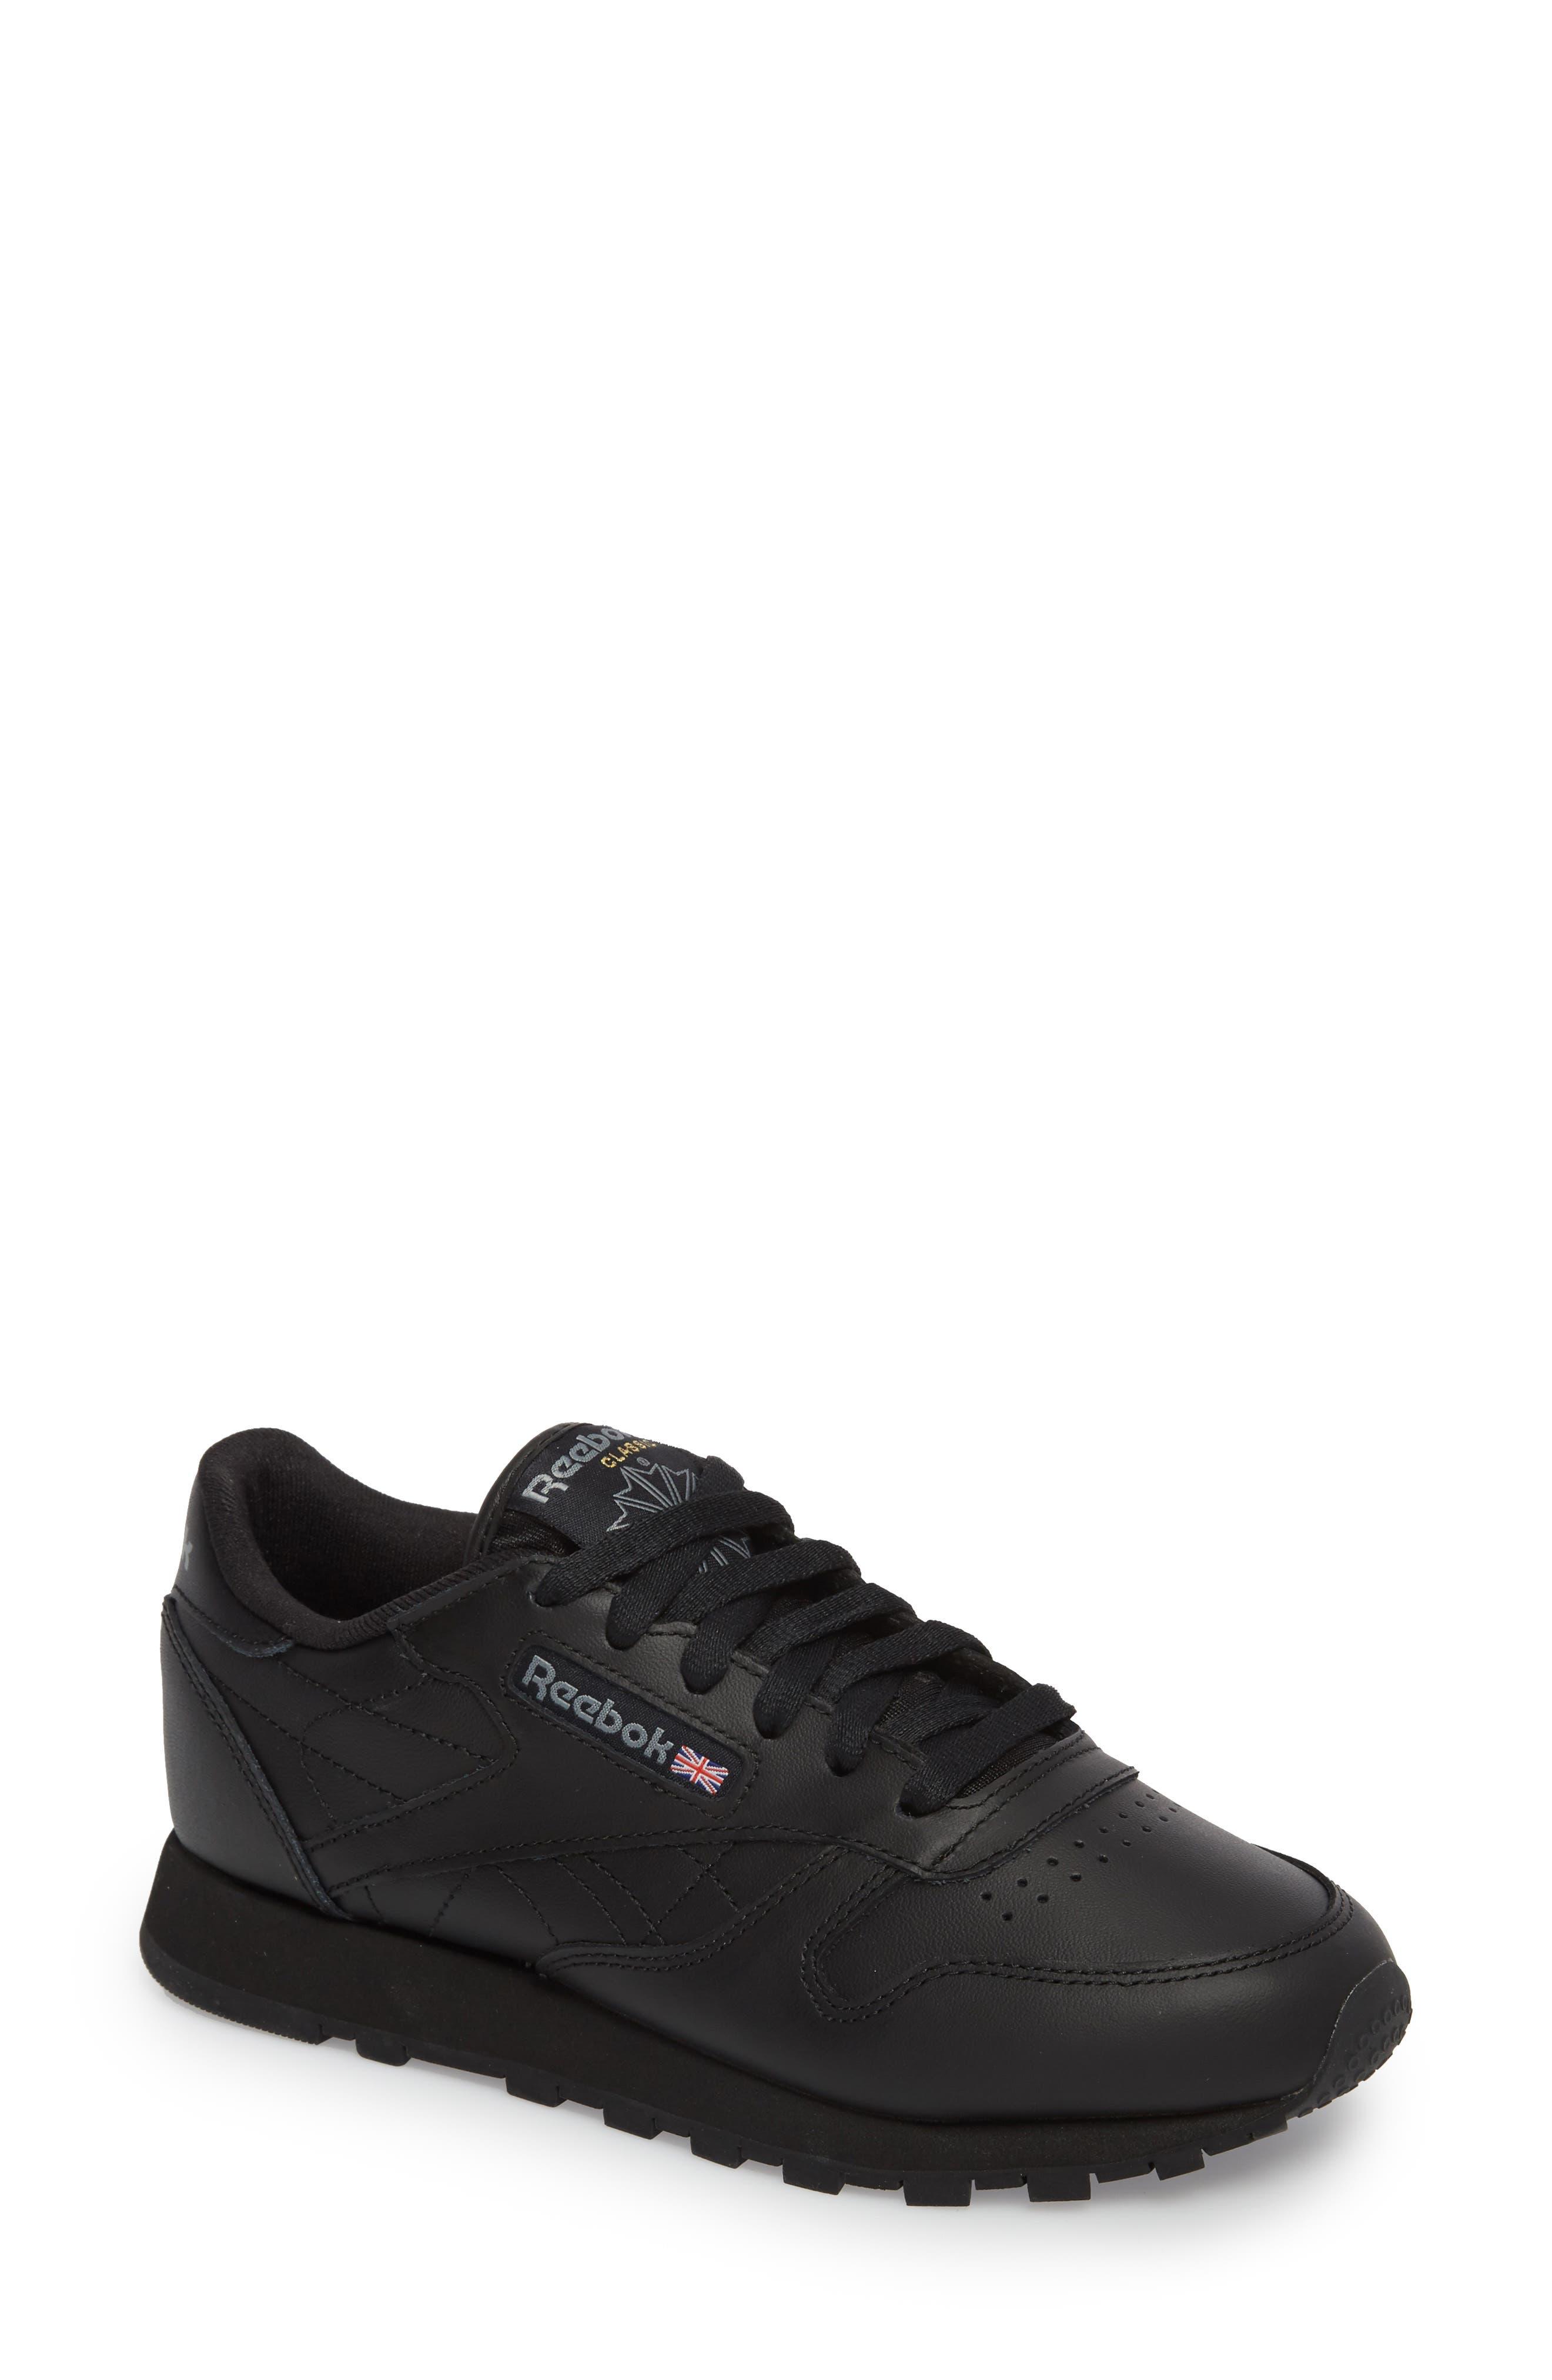 Main Image - Reebok Classic Leather Sneaker (Women)